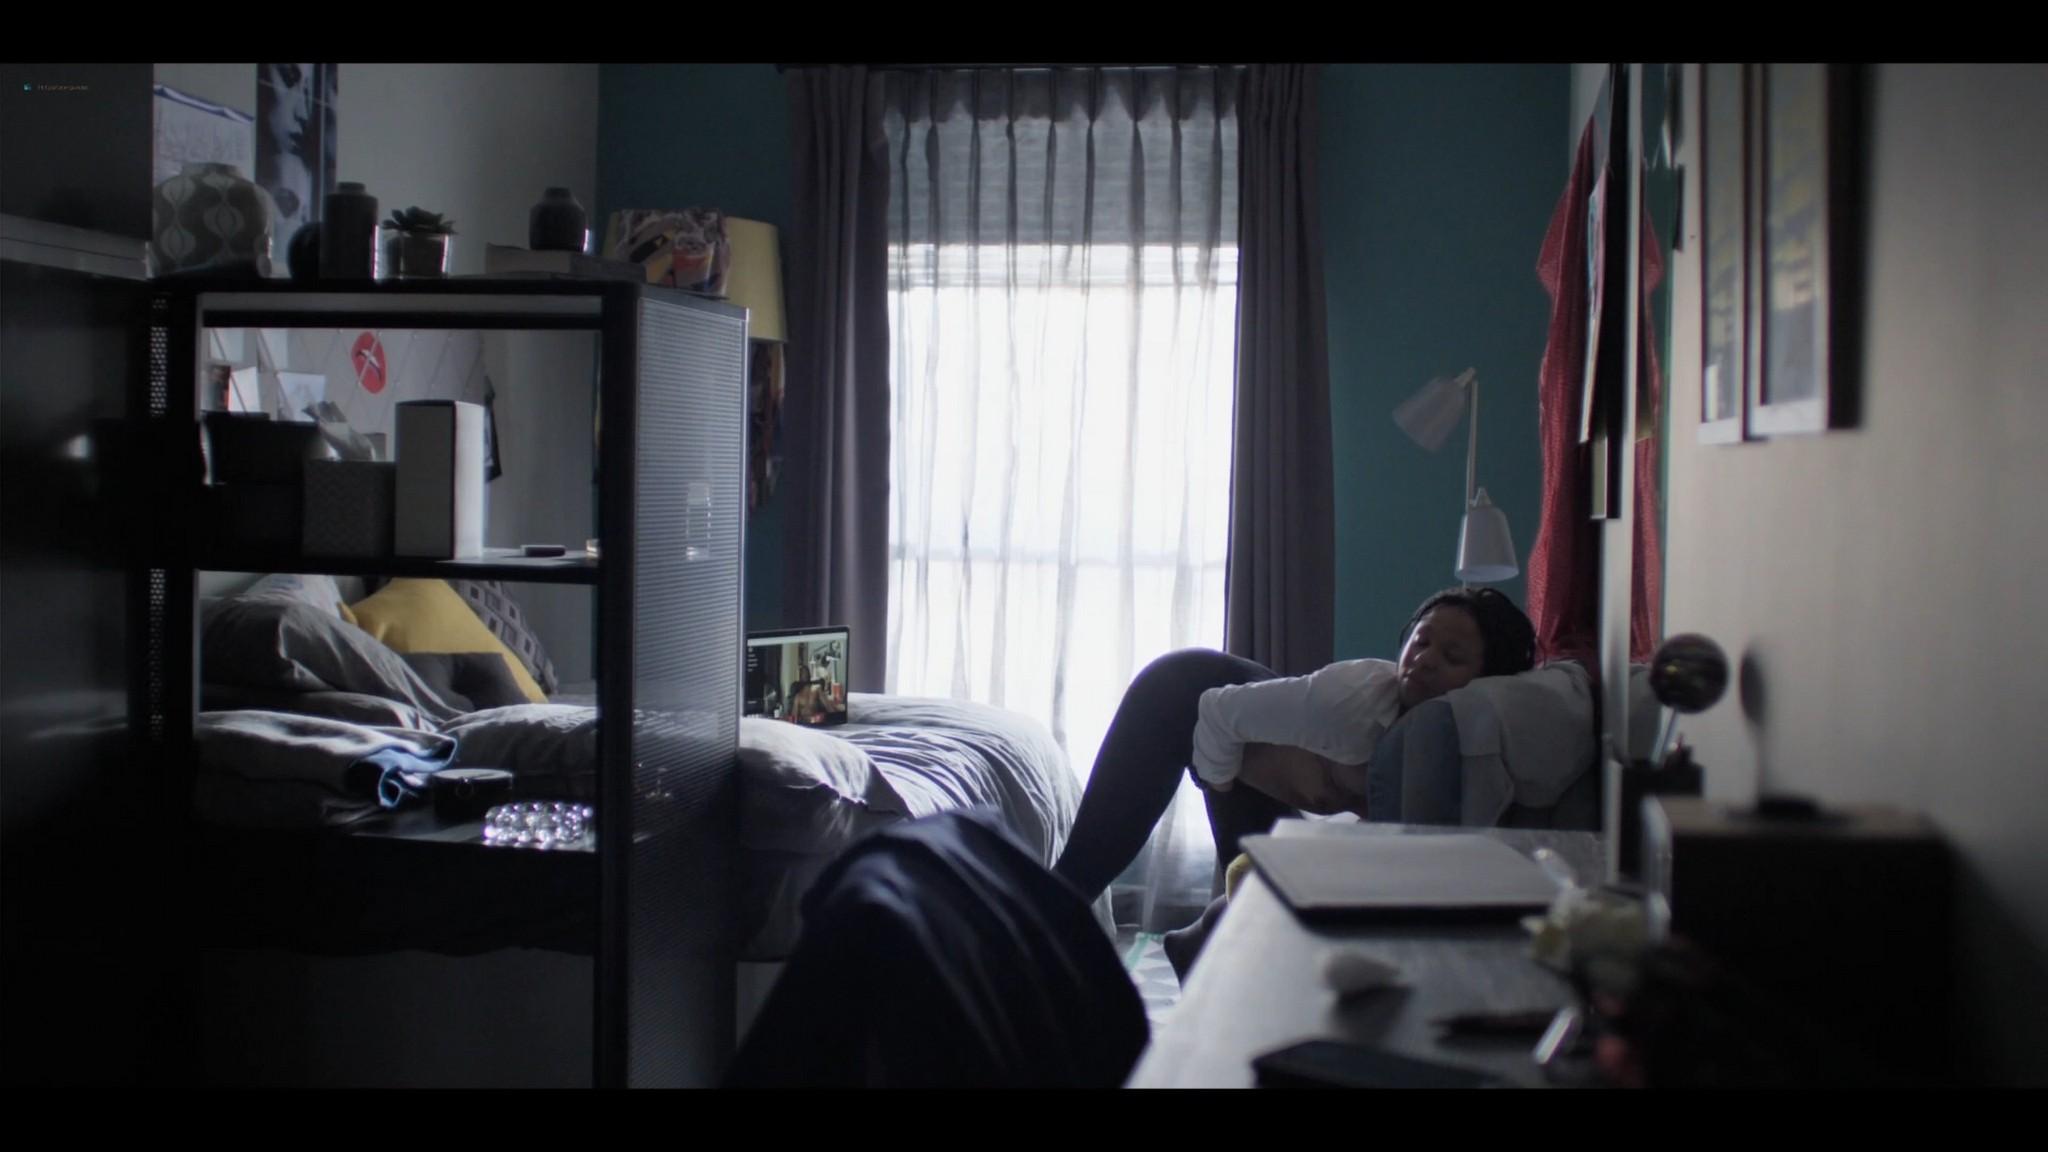 Ali Tate Cutler nude sex Myhala Herrold nude Industry 2020 s1e1 HD 1080p 004